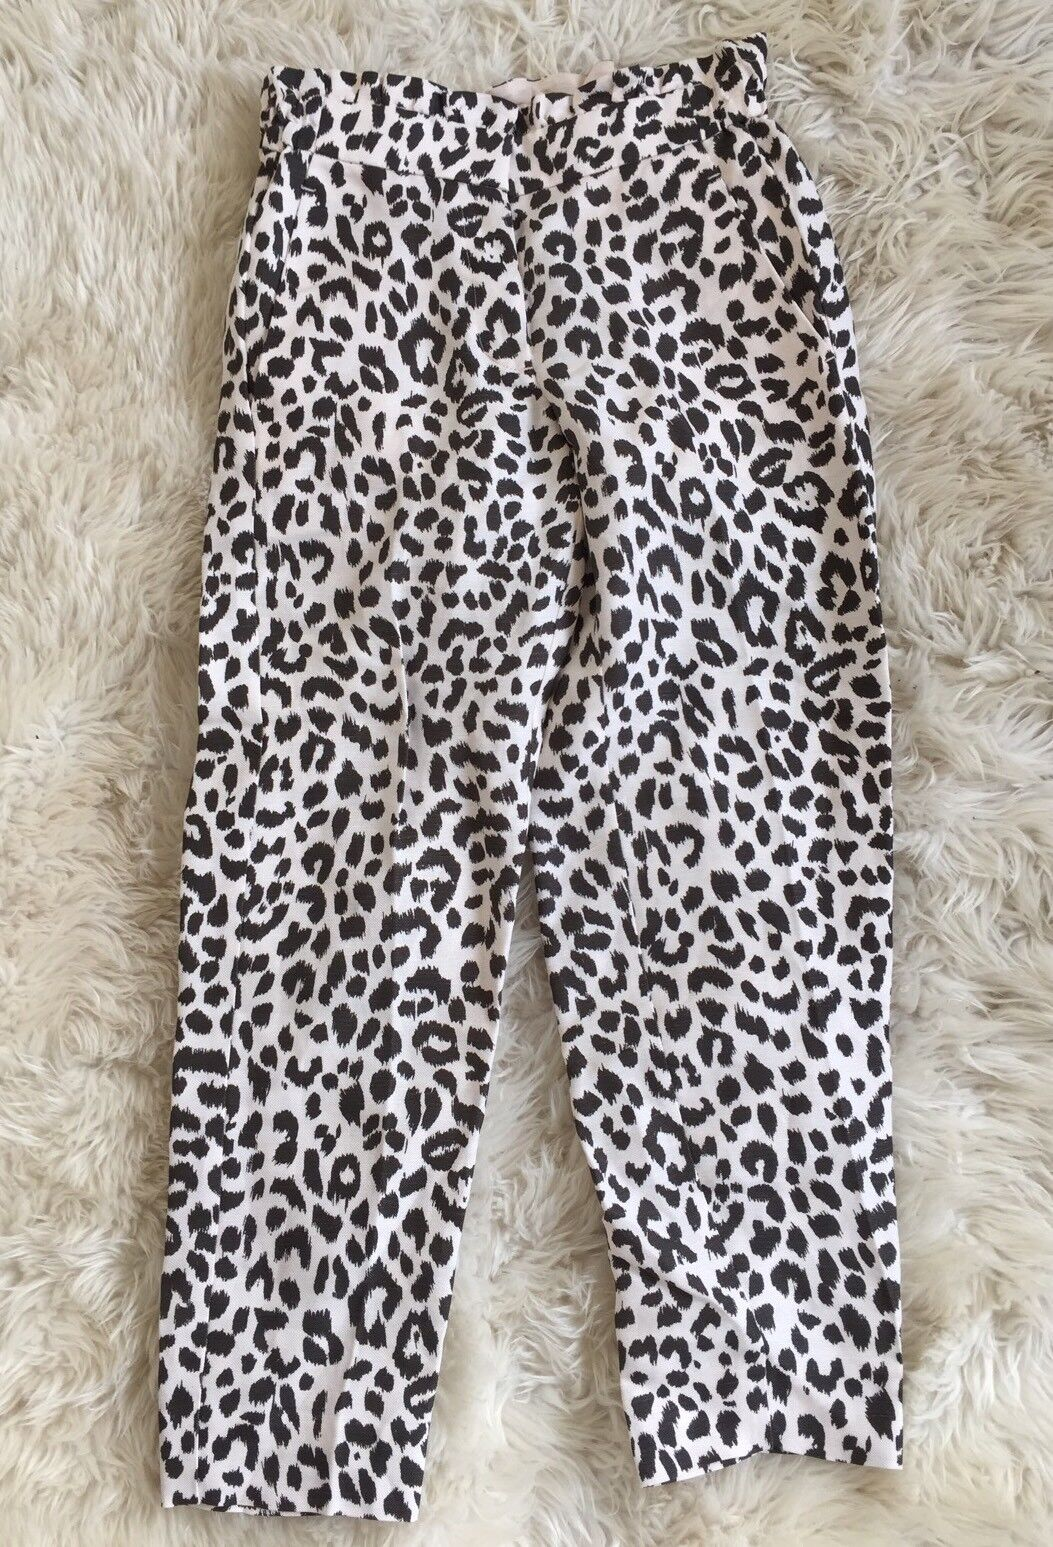 NEW Womens JCrew Ruffle Waist Linen Pants in Leopard Print Size 0 G2019 NEW